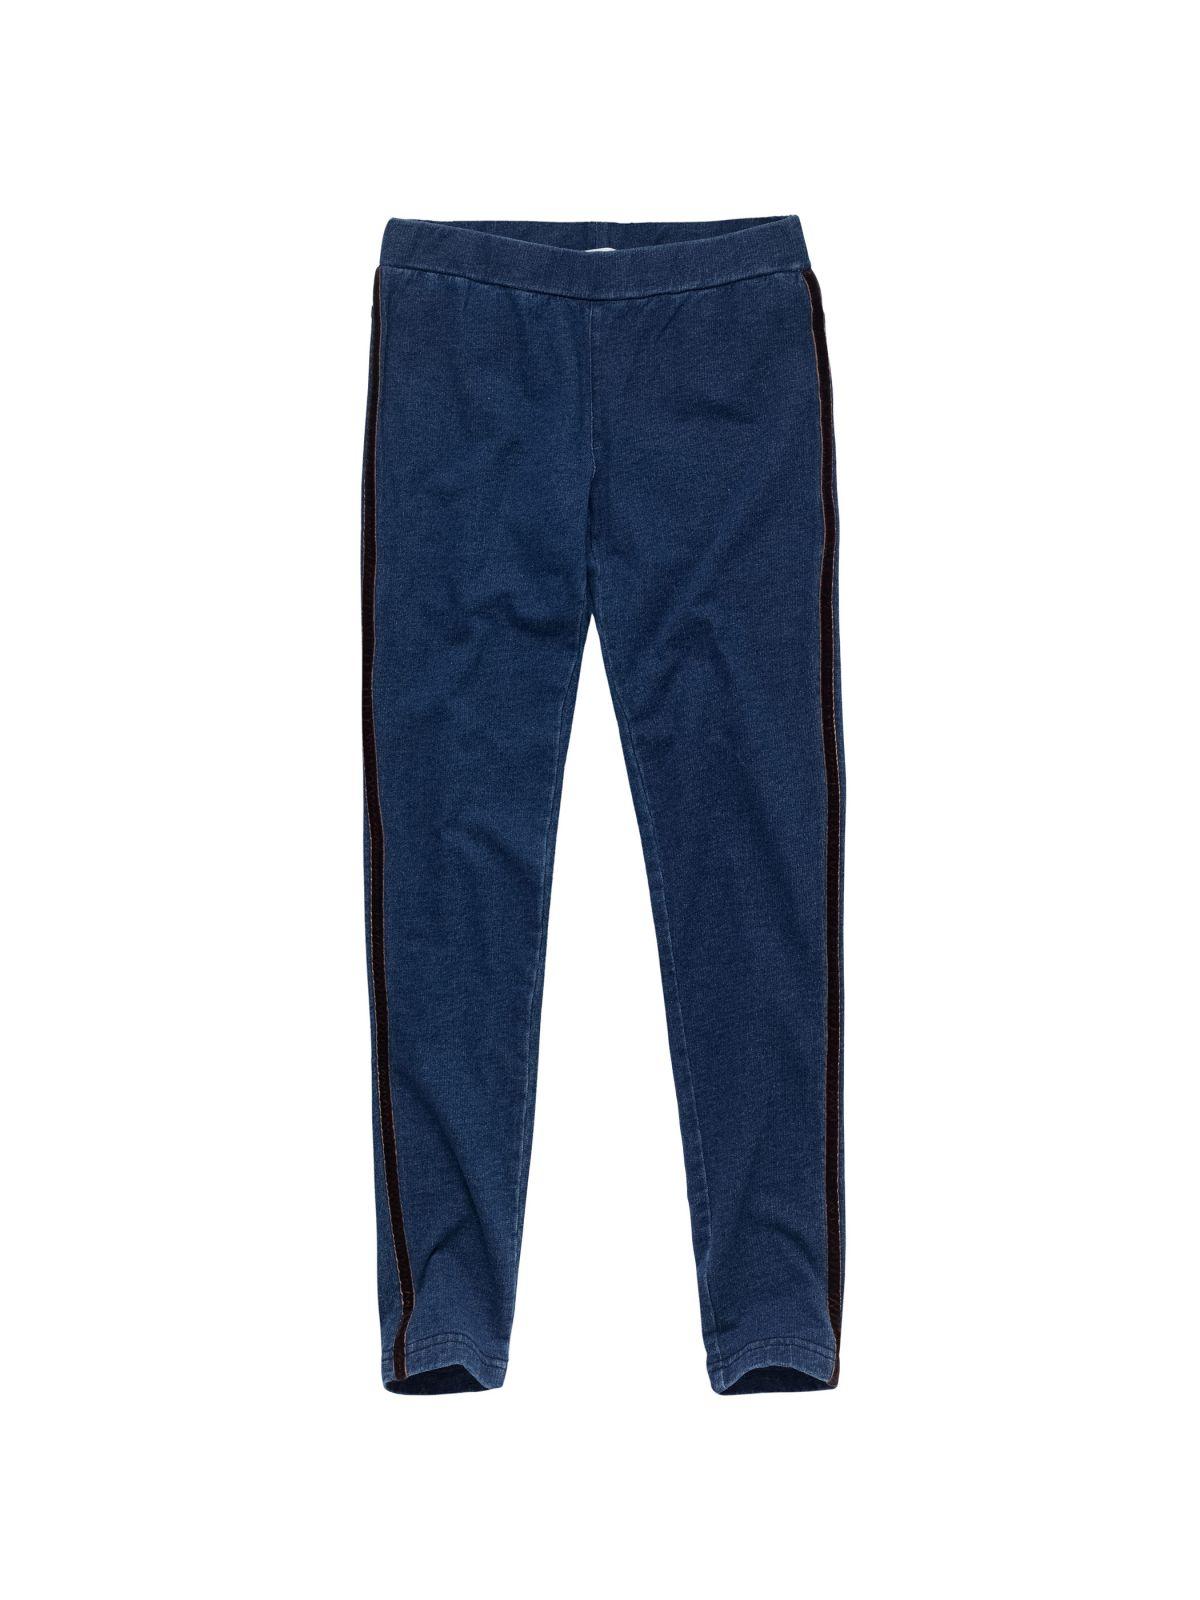 מכנסיים דמוי ג'ינס עם סטריפים / בנותמכנסיים דמוי ג'ינס עם סטריפים / בנות של FOX